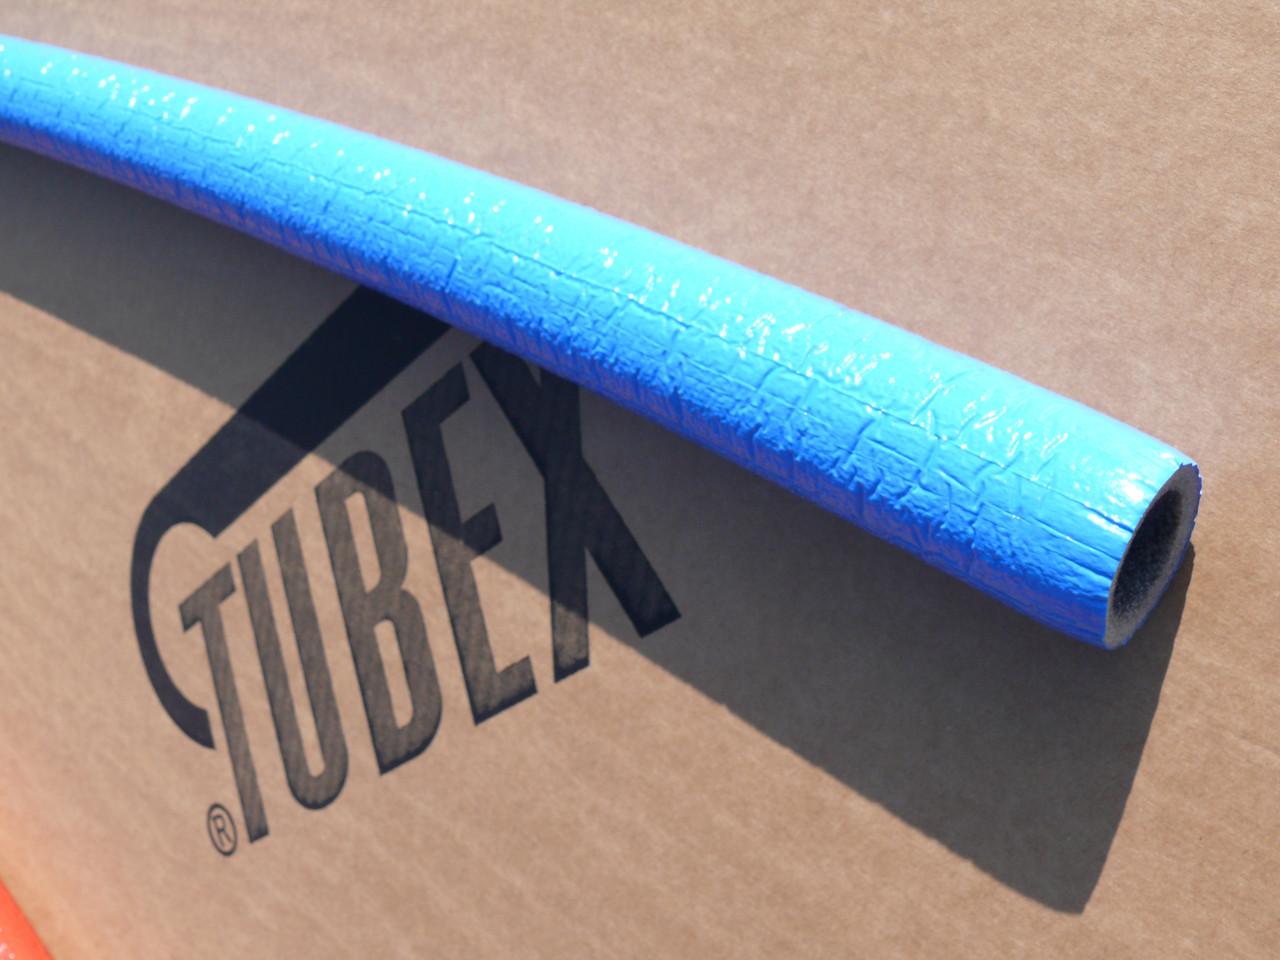 ИЗОЛЯЦИЯ ДЛЯ ТРУБ TUBEX® Protekt, синня, внутренний диаметр 18 мм, толщина стенки 6 мм, производитель Чехия